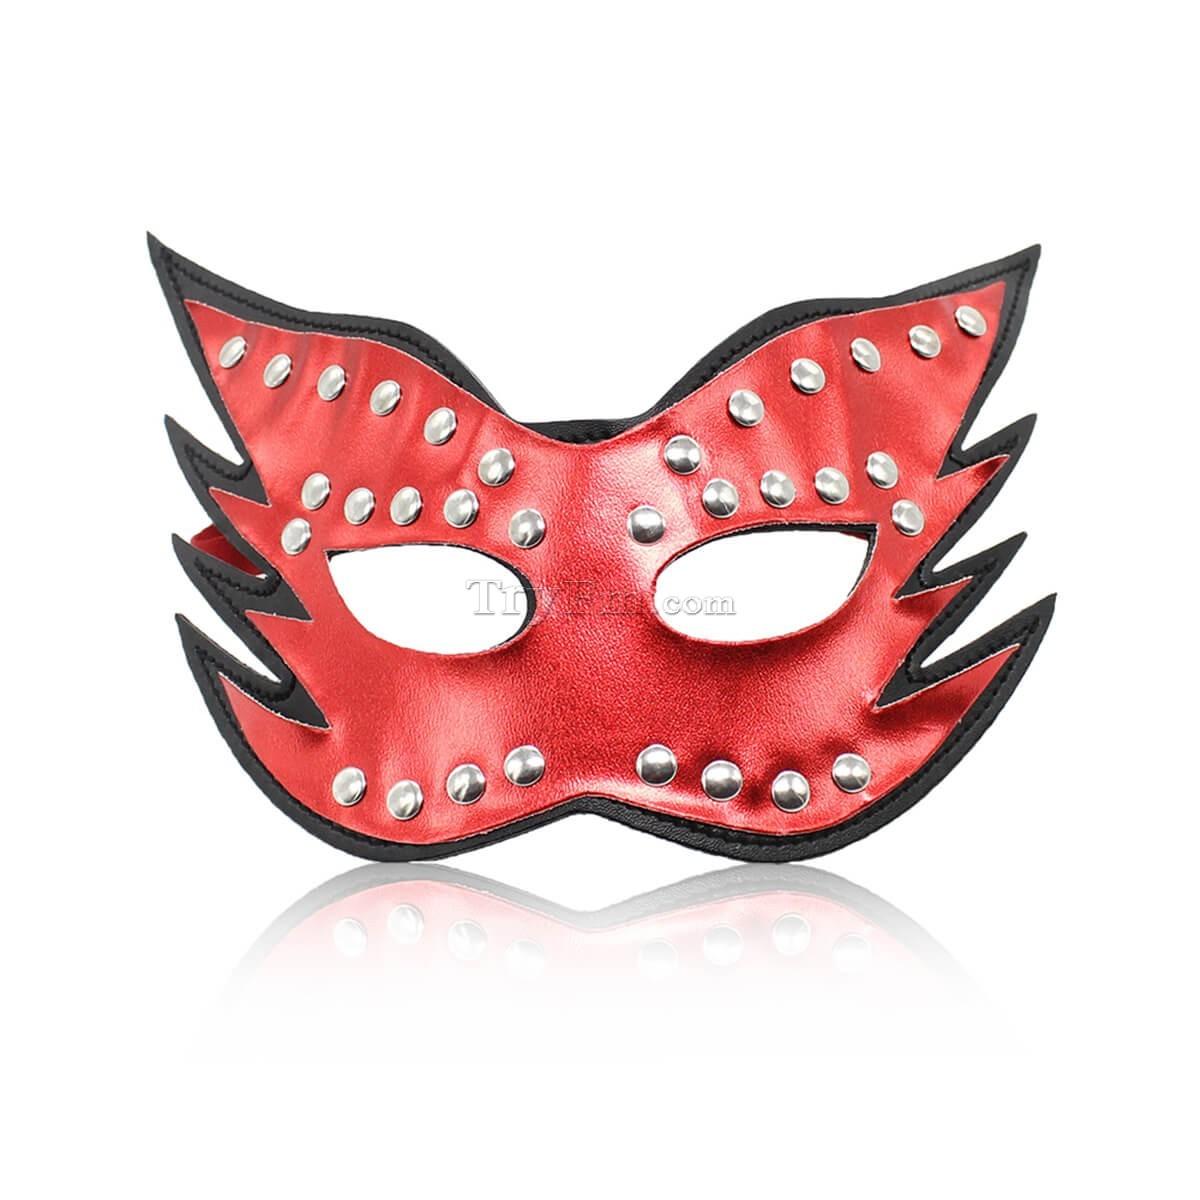 4-animal-eye-mask5.jpg